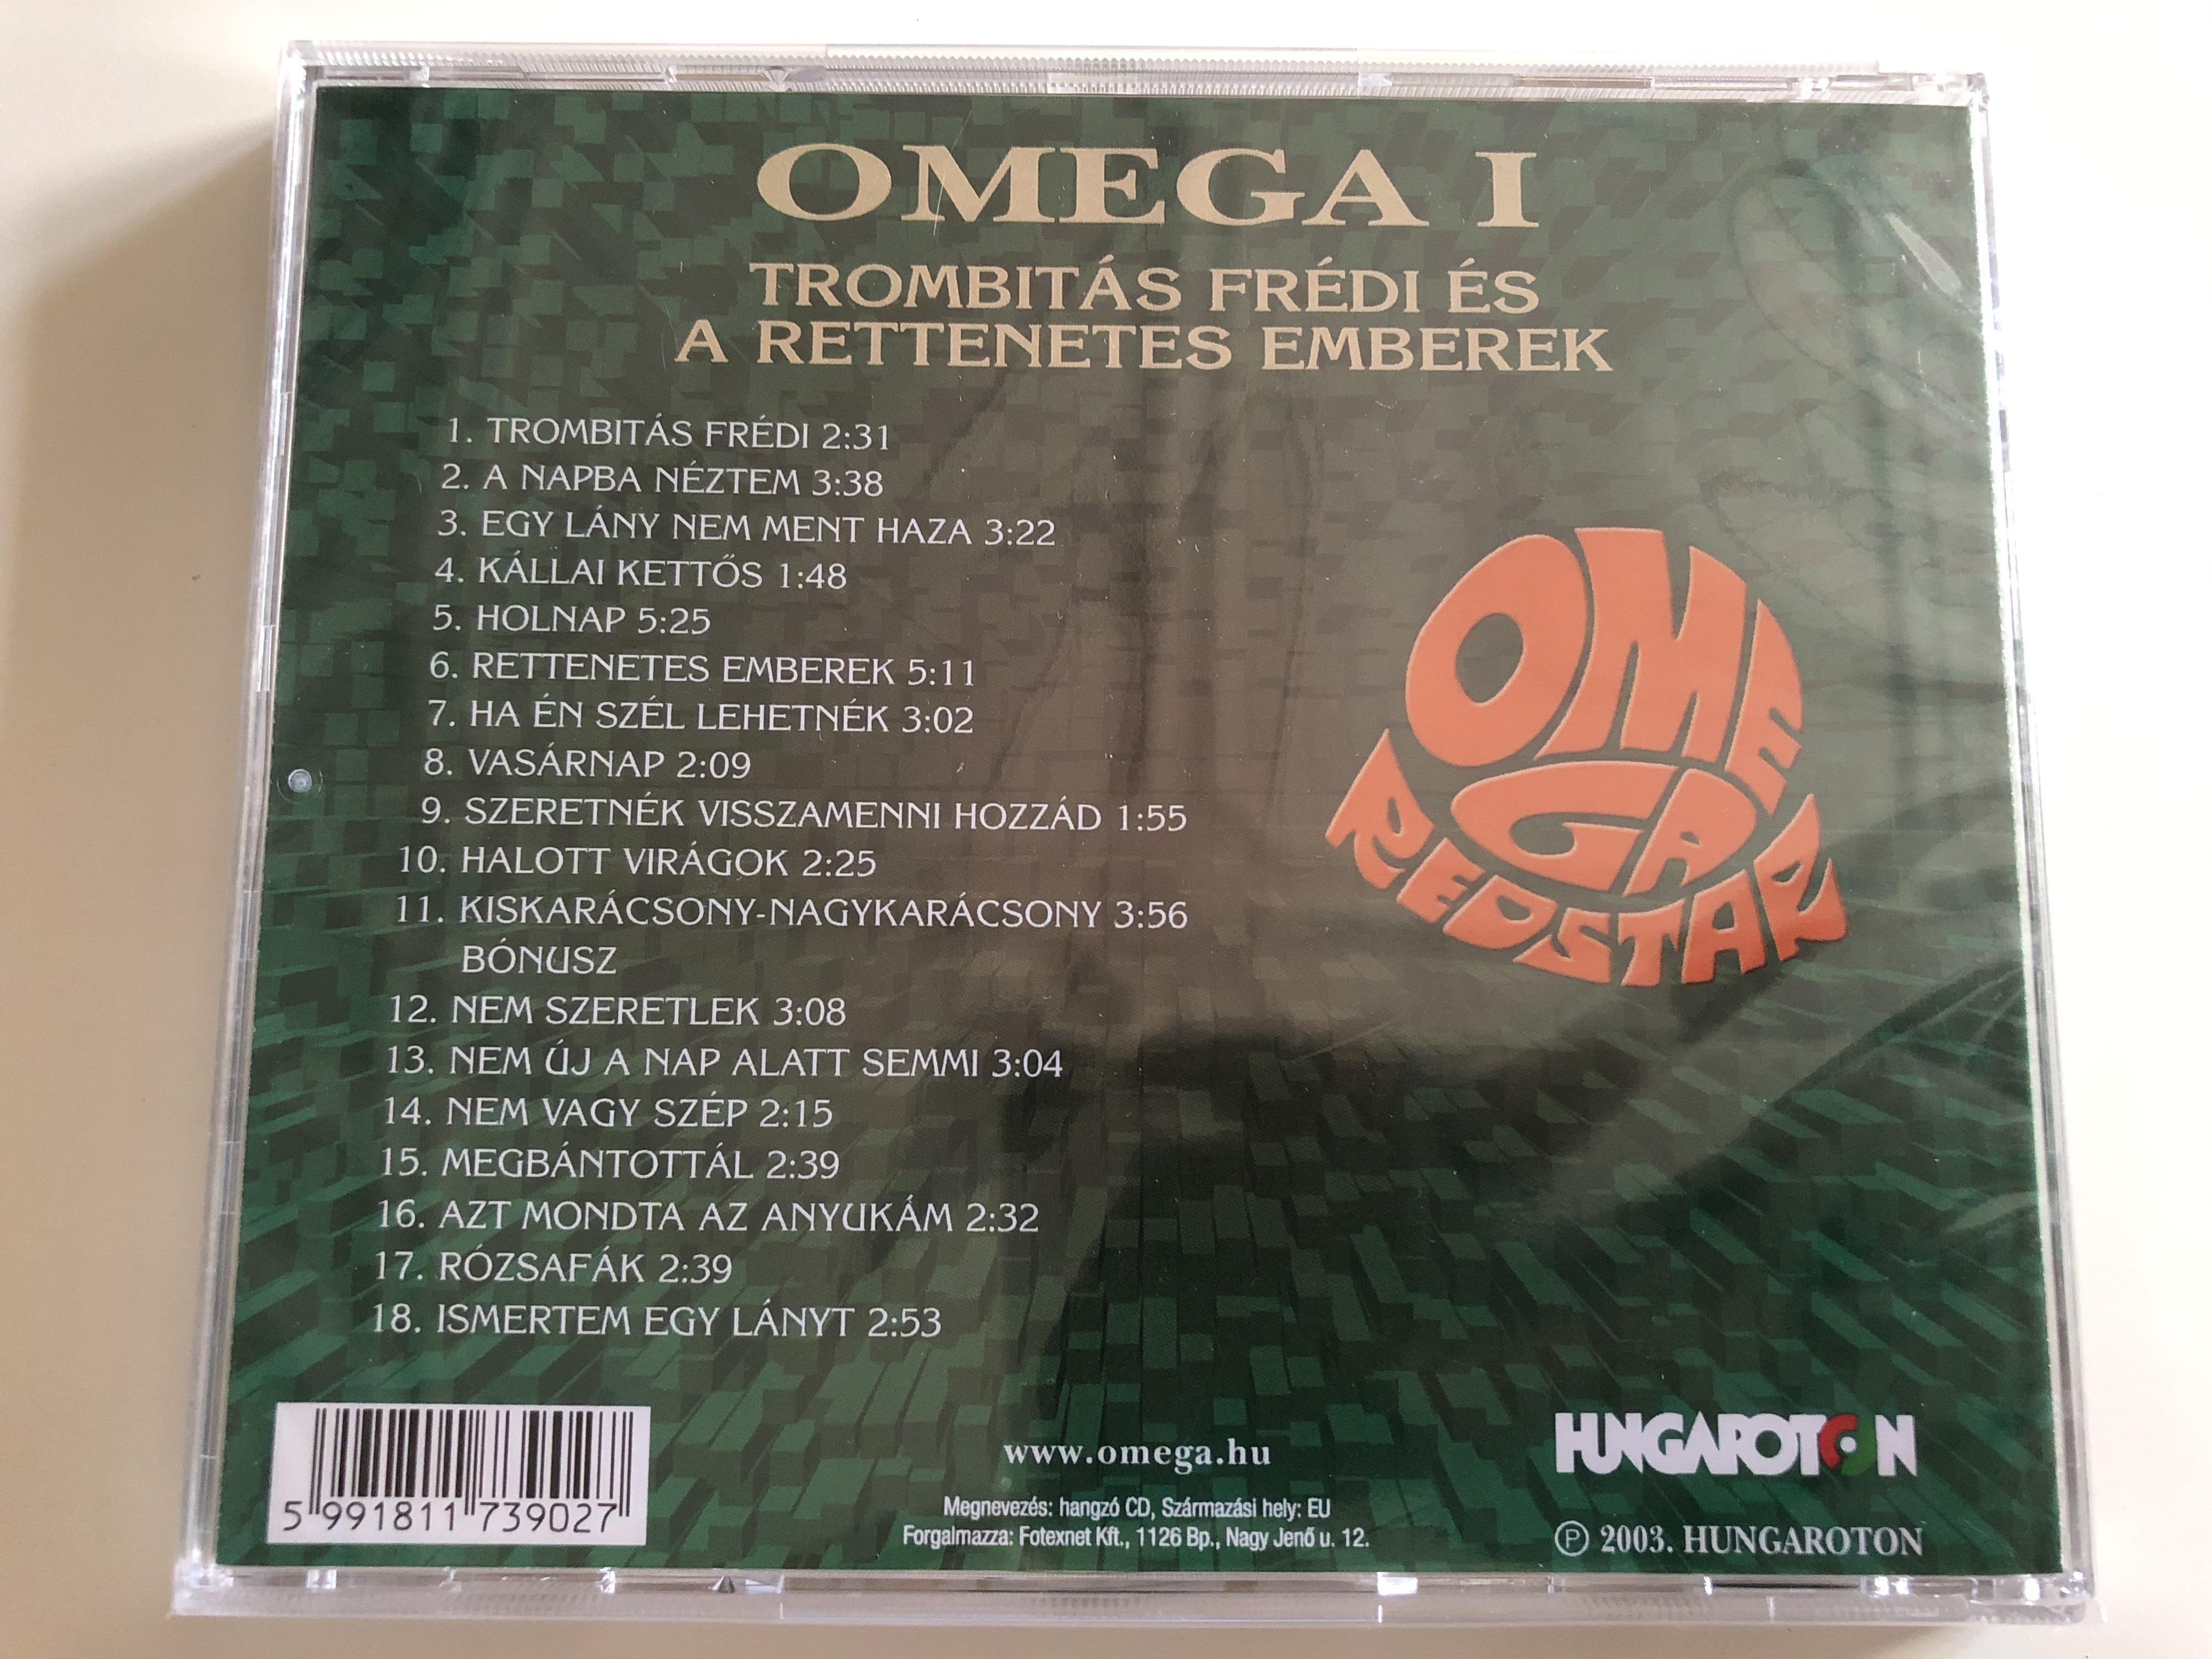 trombit-s-fr-di-s-a-rettenetes-emberek-omega-hungaroton-audio-cd-2003-hcd-17390-2-.jpg